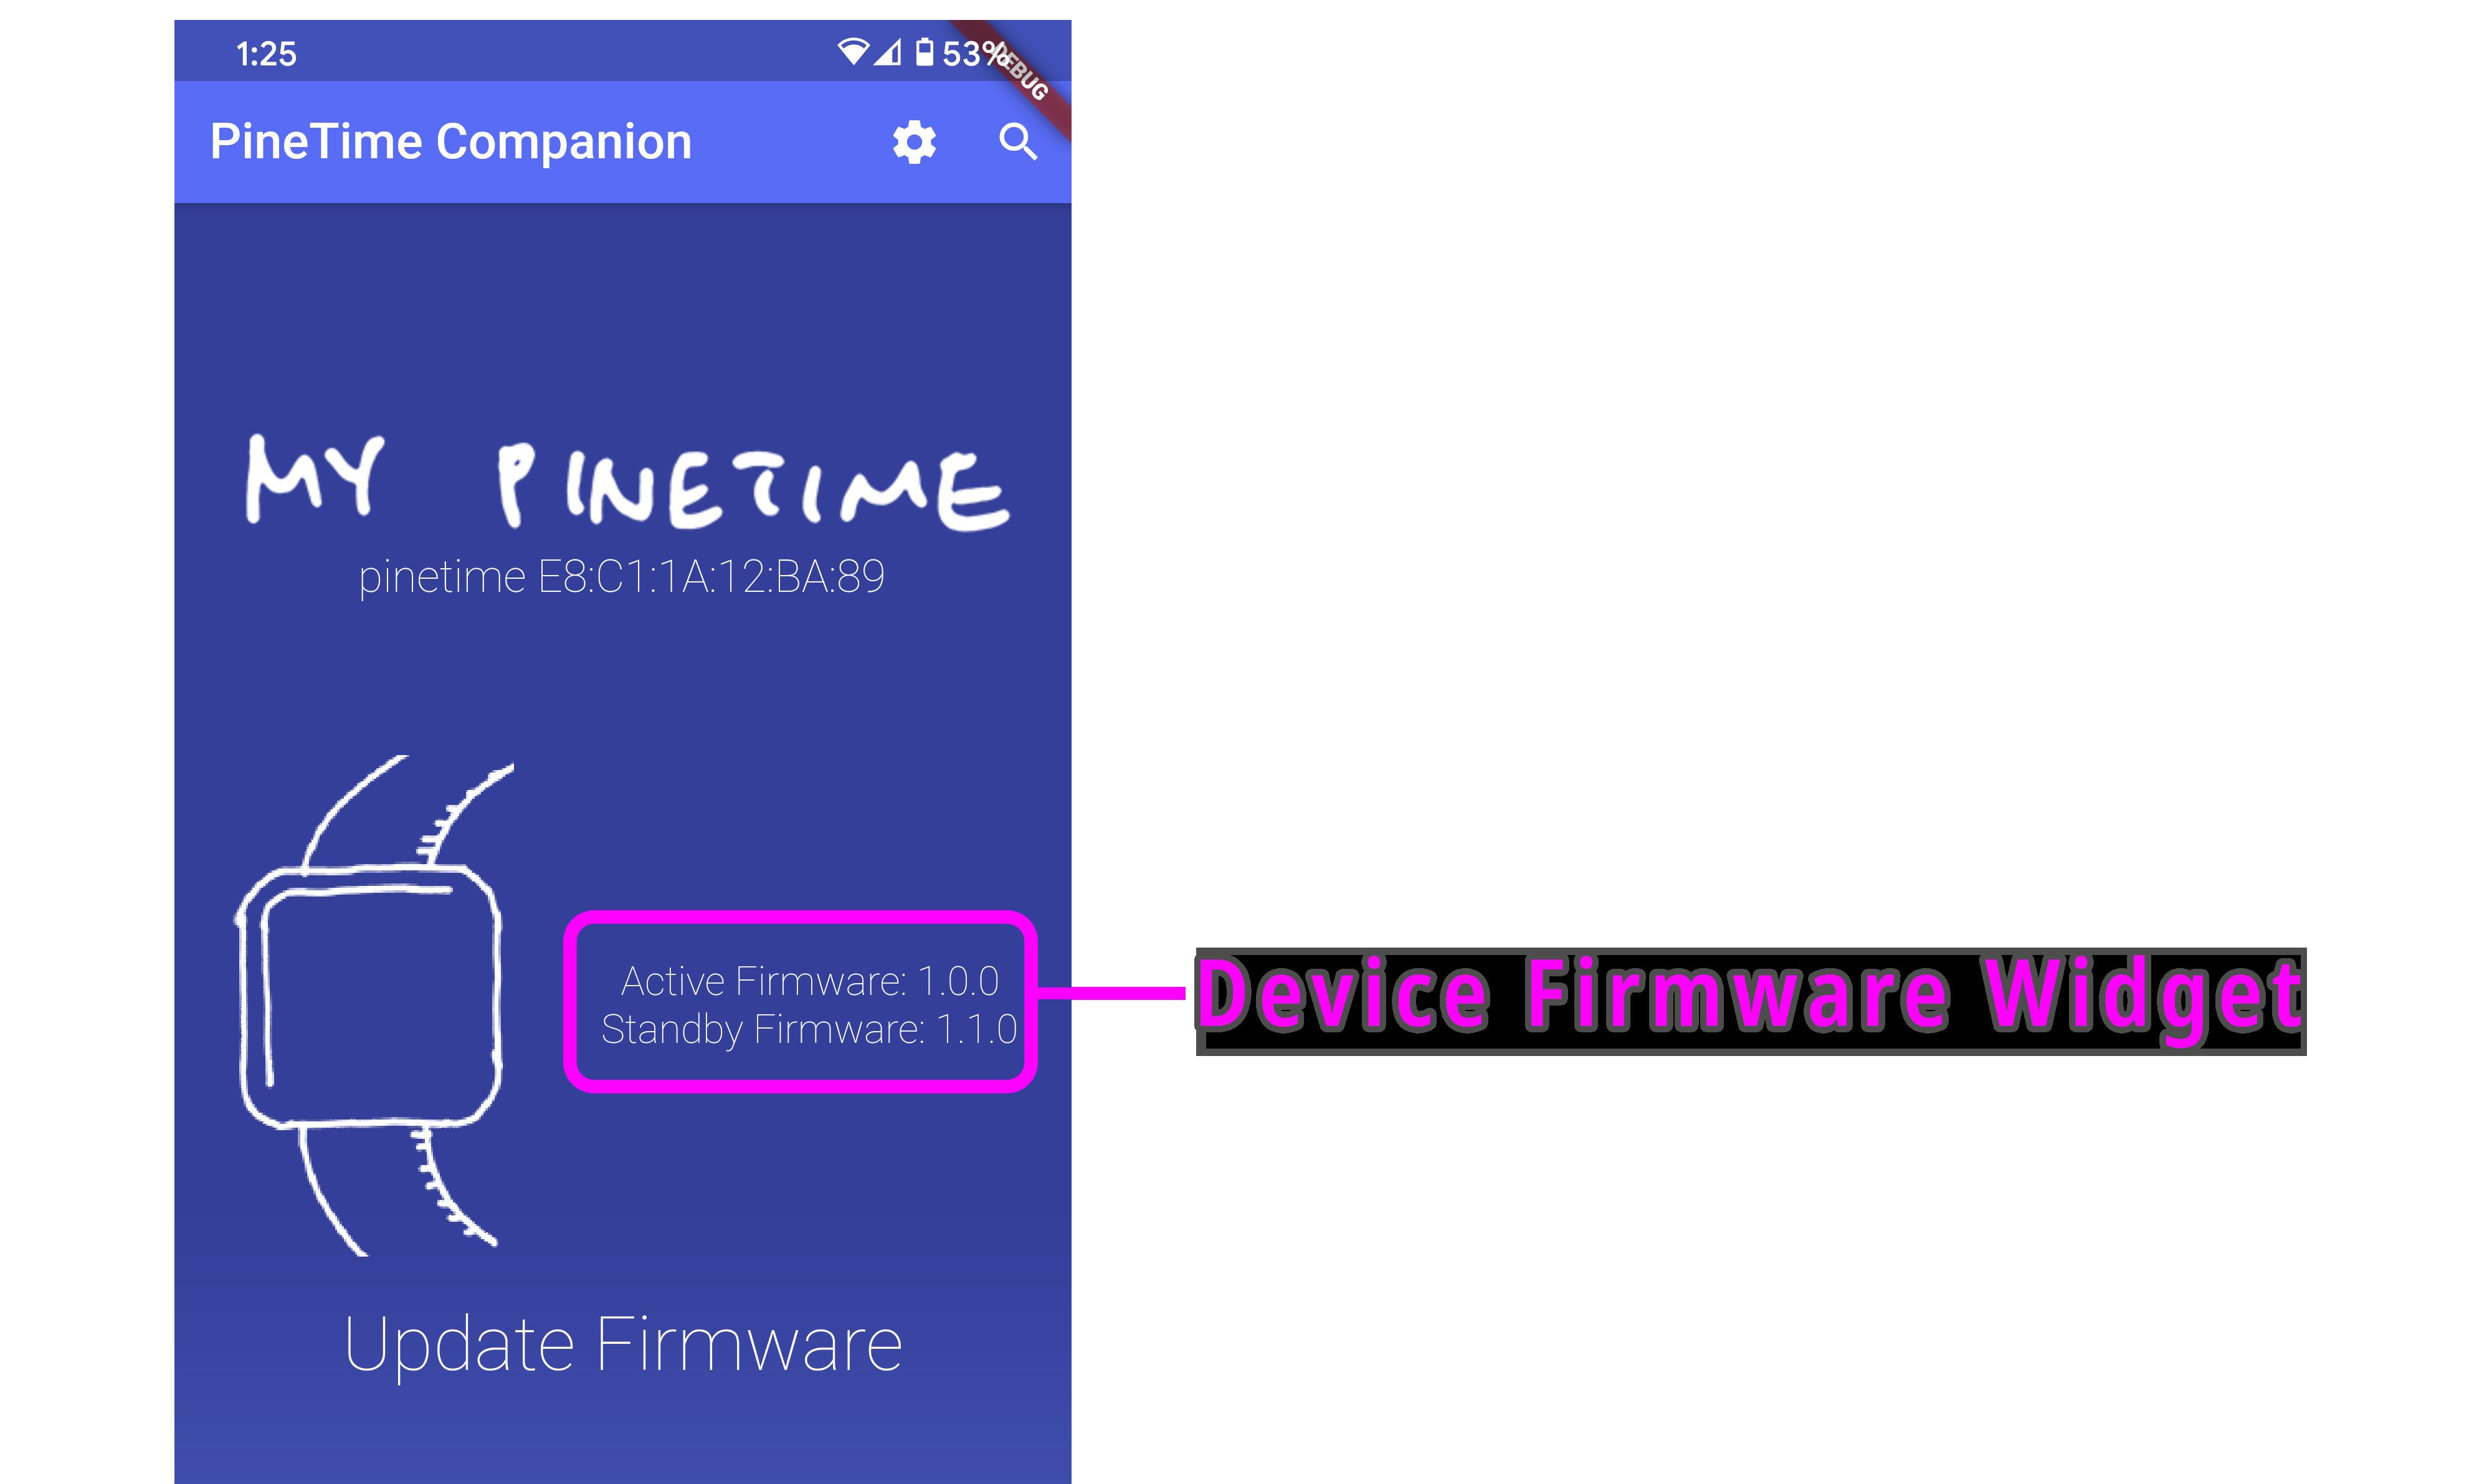 Device Firmware Widget